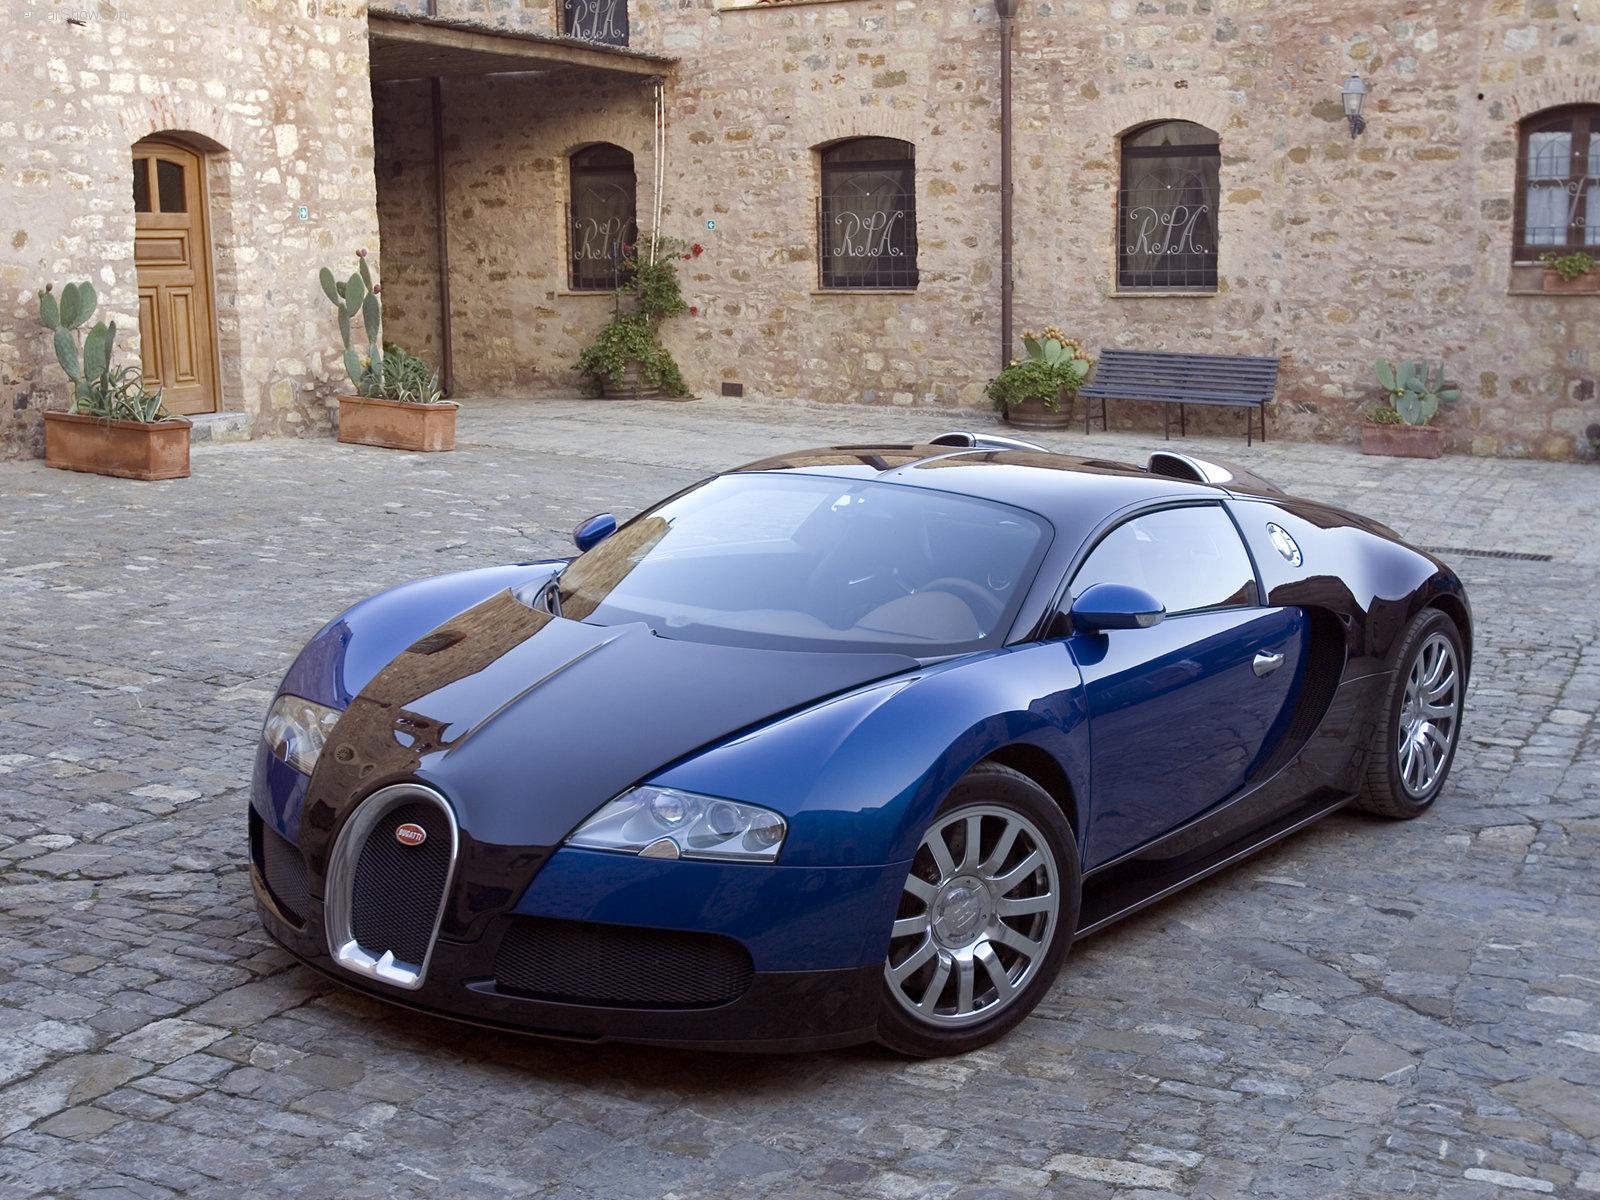 wallpapers bugatti veyron hd wallpapers bugatti veyron hd wallpapers 1600x1200